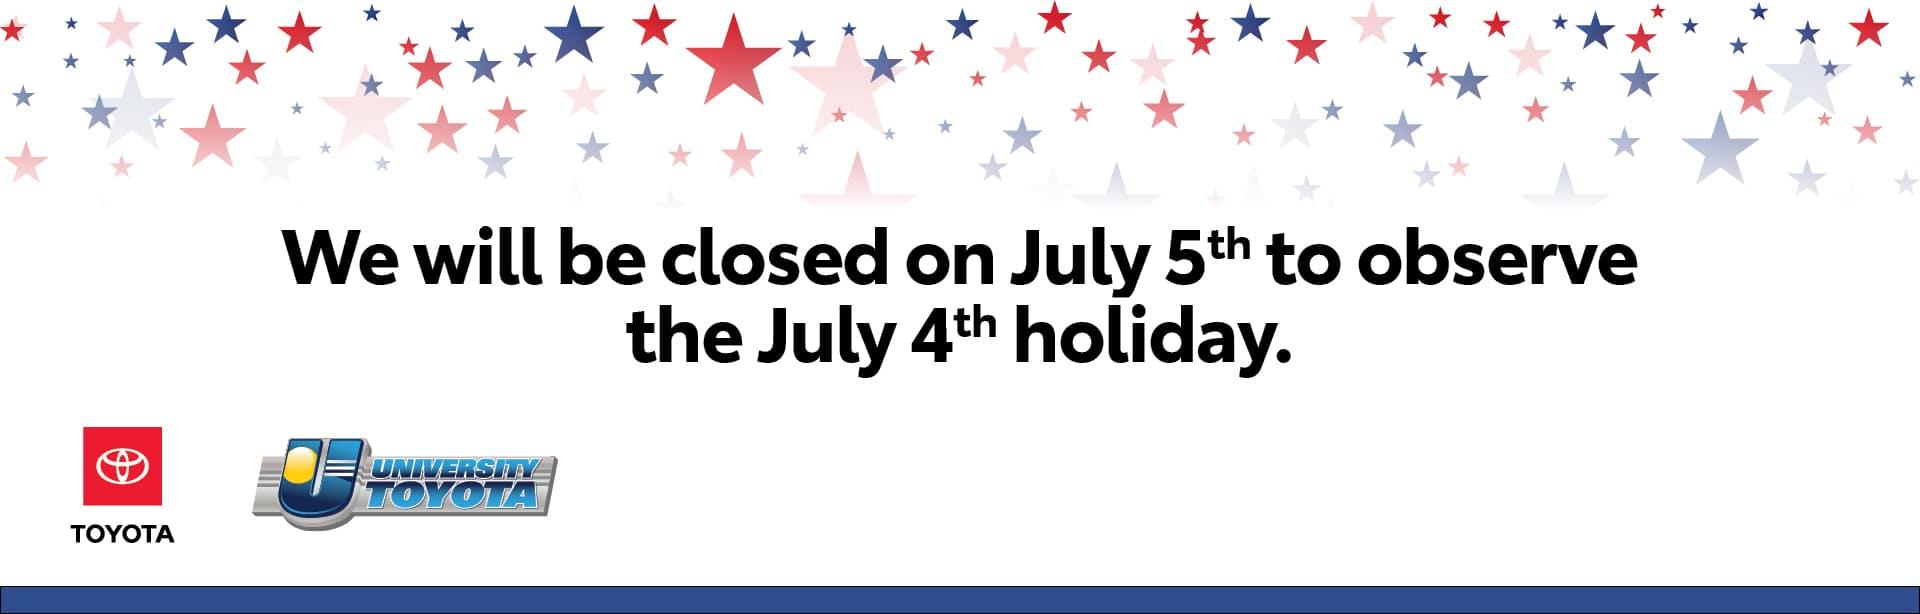 Closed July 5th